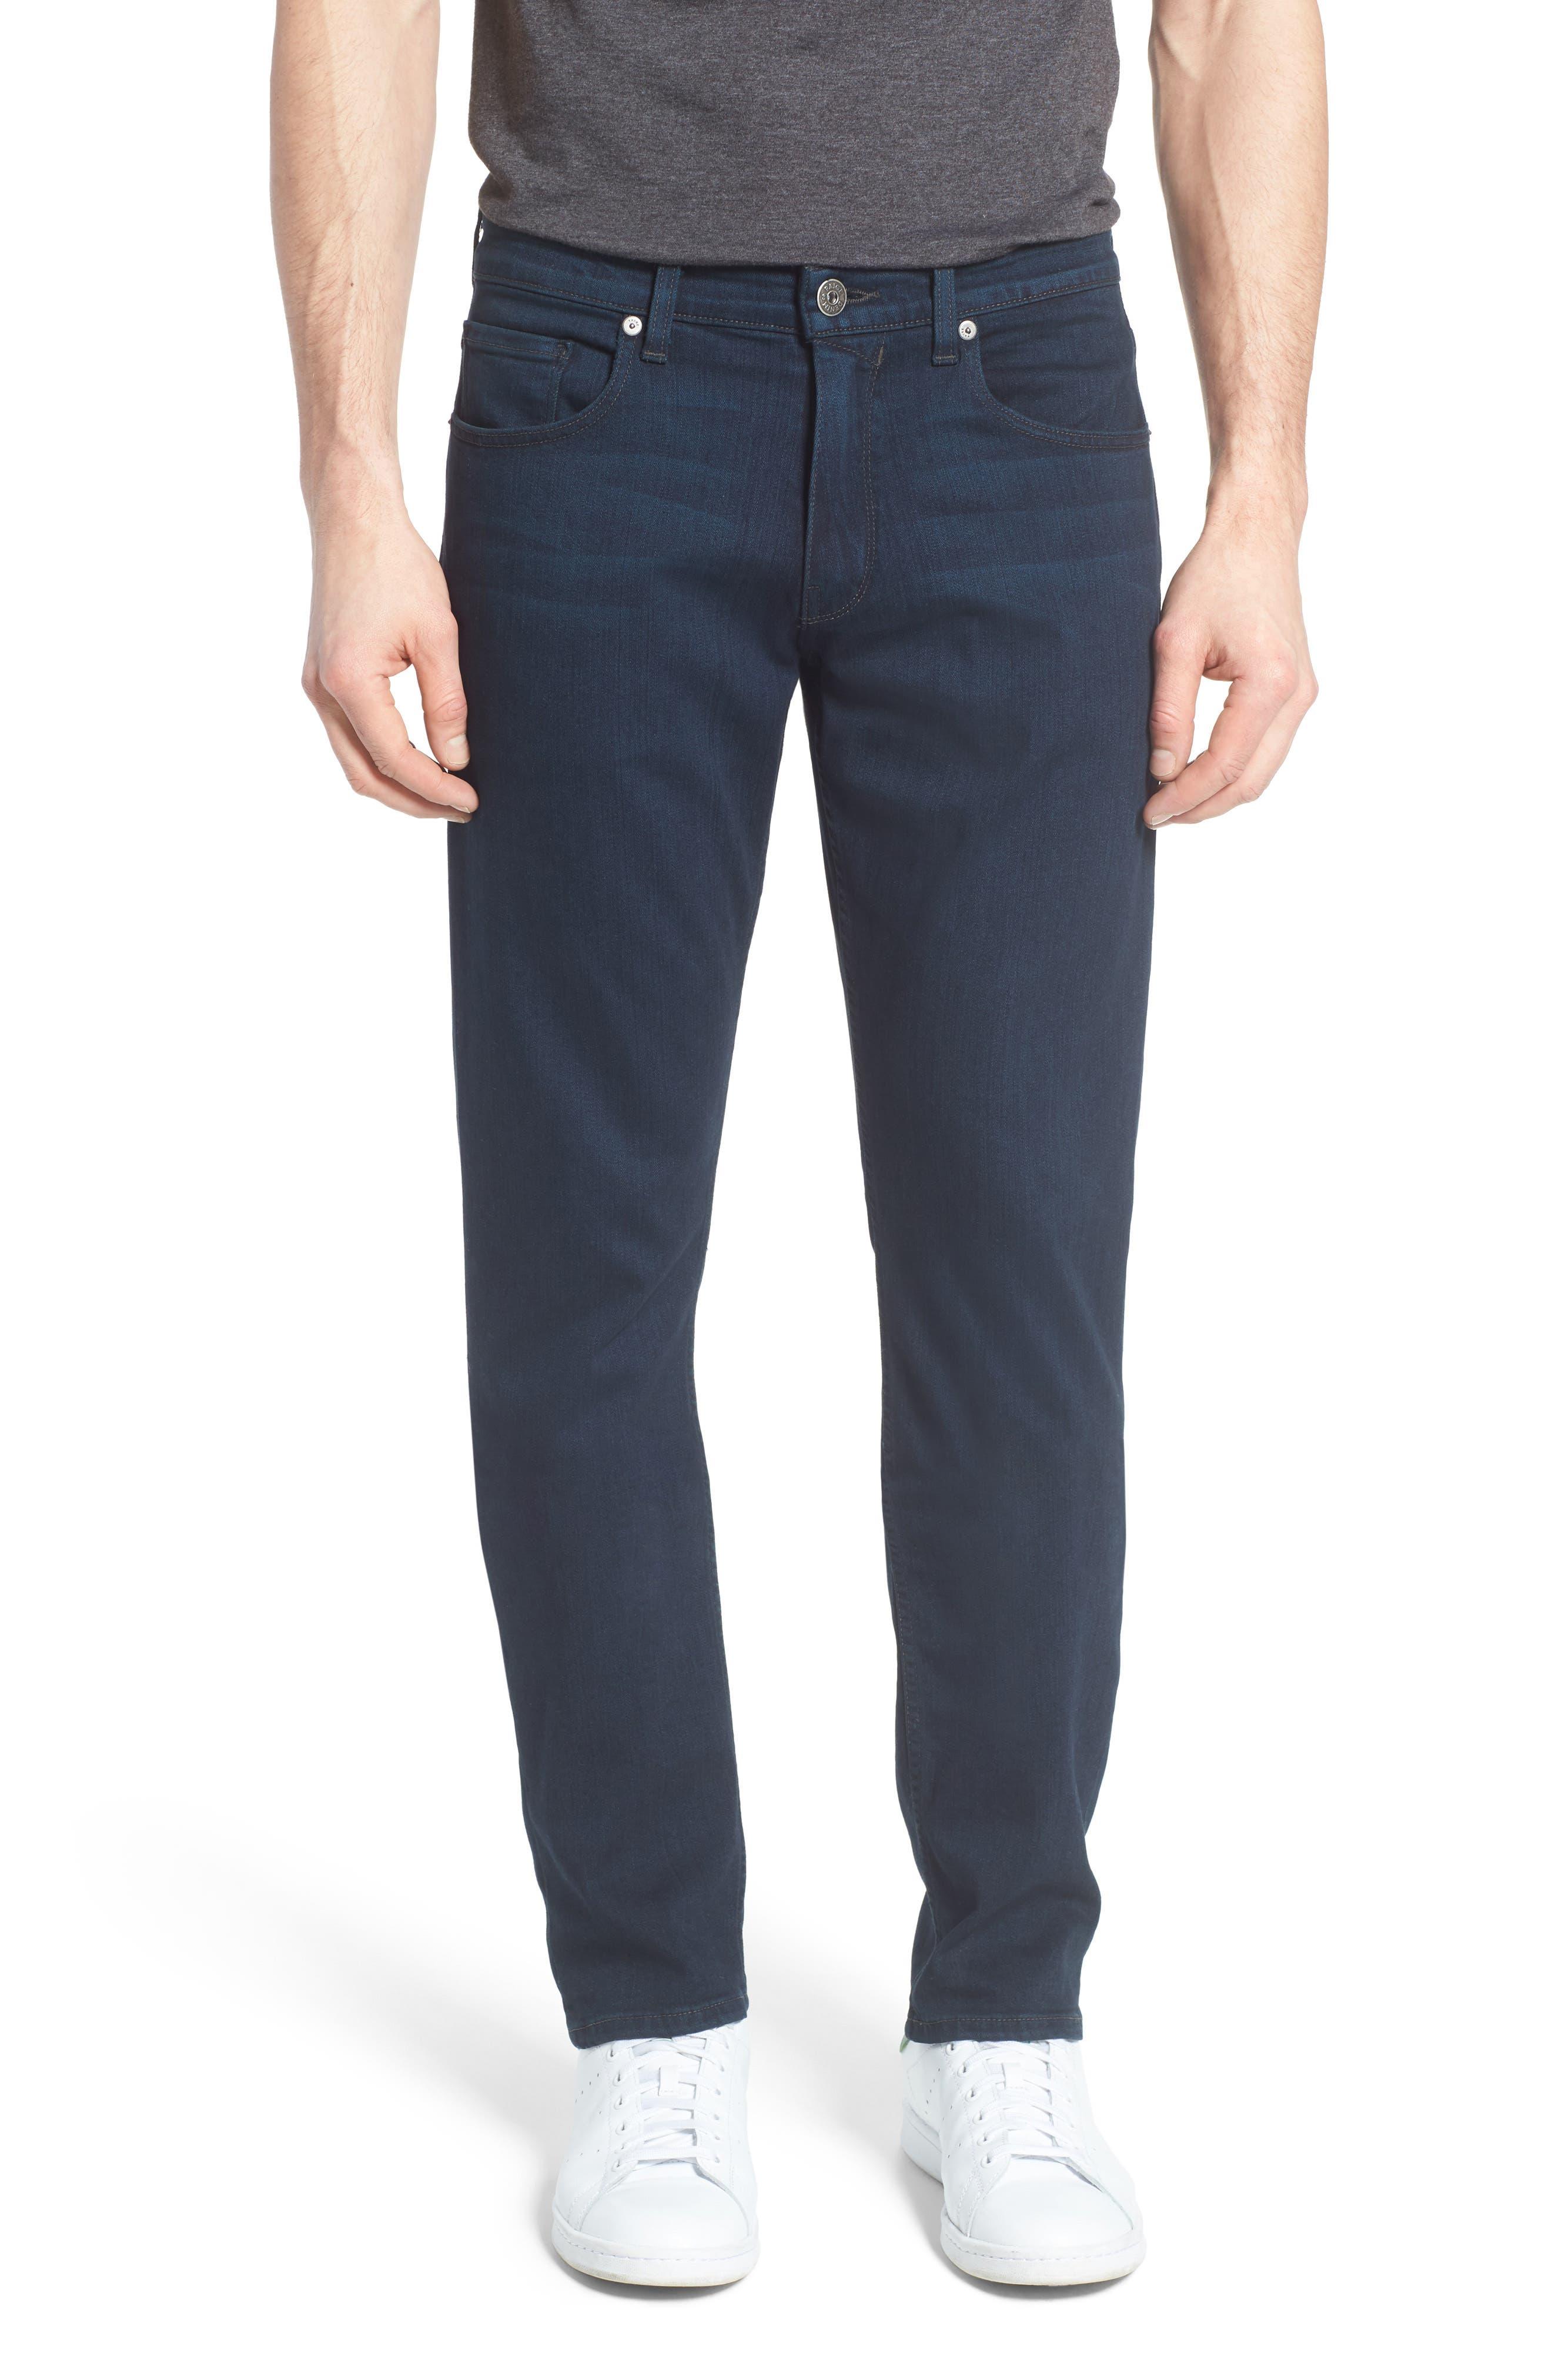 Main Image - PAIGE Transcend - Federal Slim Straight Leg Jeans (Arlo)